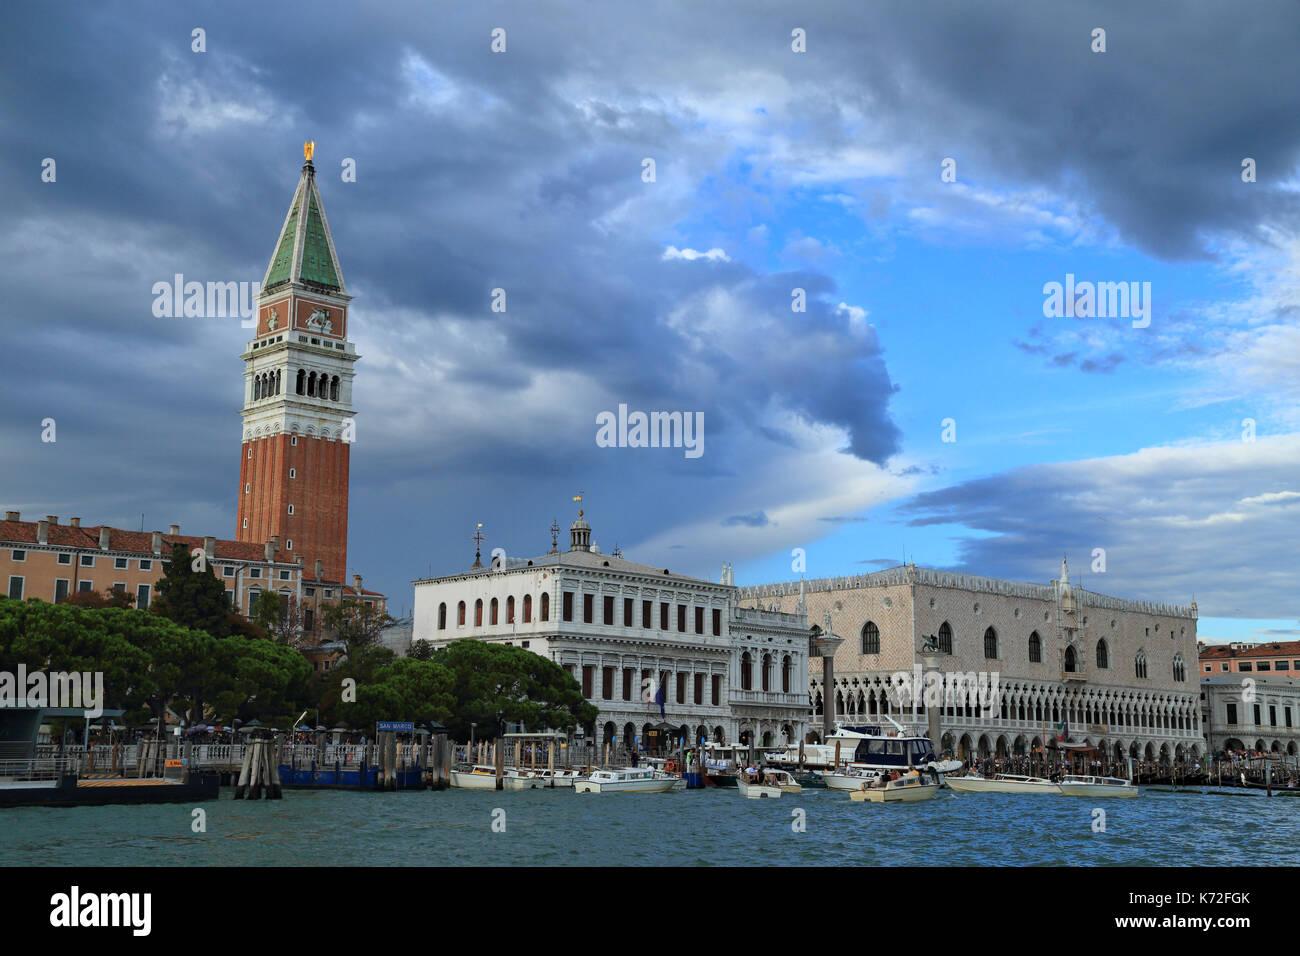 Dark clouds hang over Venice - Stock Image